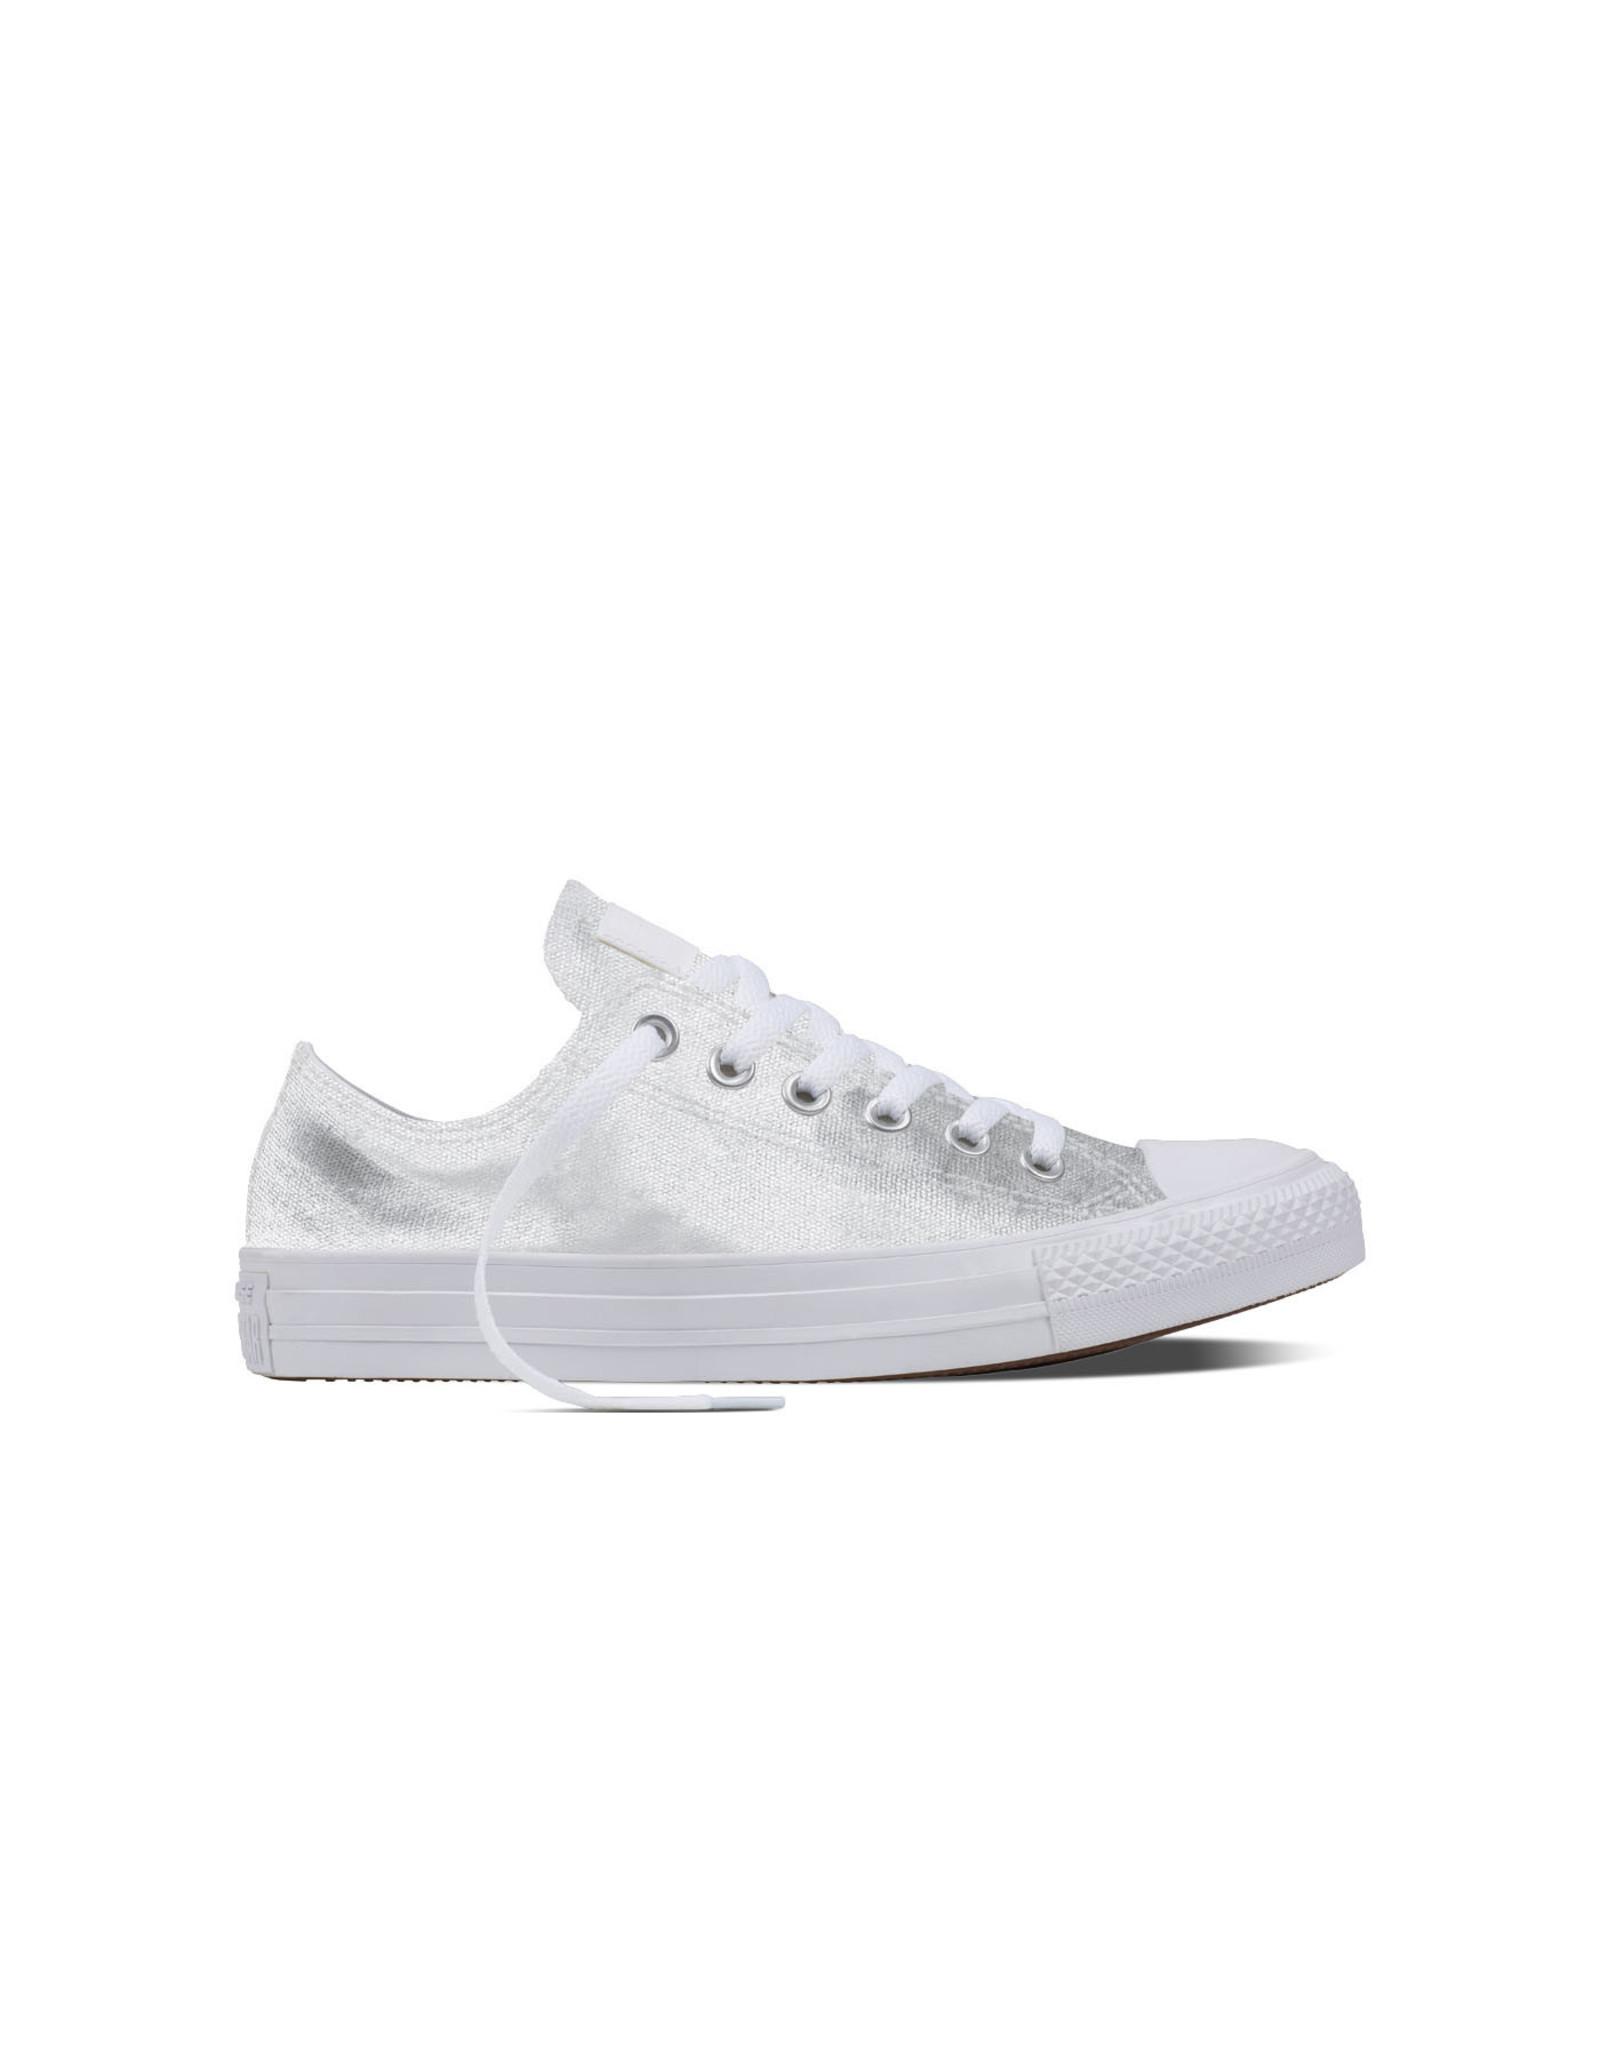 CONVERSE CHUCK TAYLOR OX WHITE/WHITE/WHITE C11MW-155564C